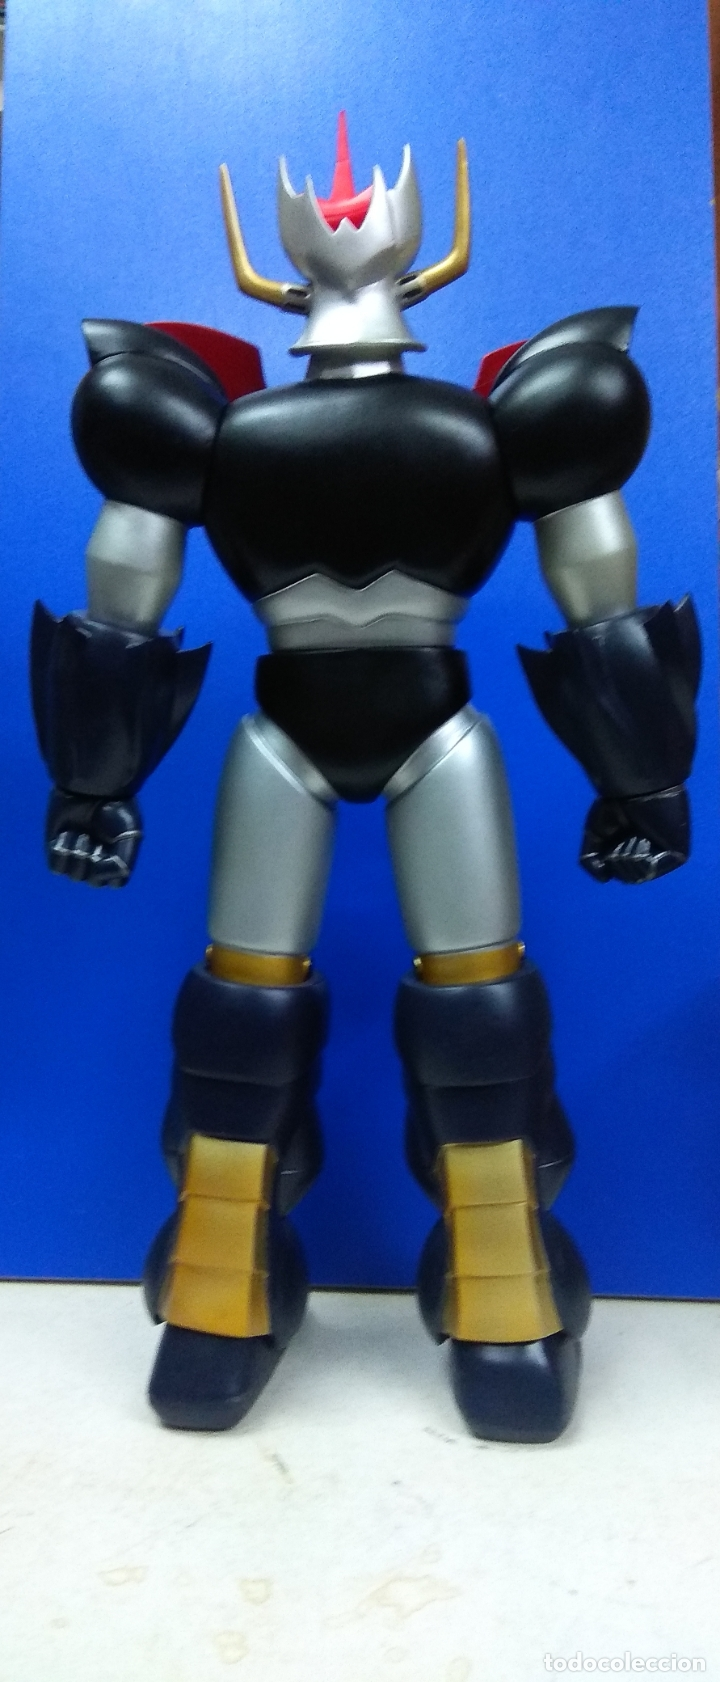 Figuras y Muñecos Manga: ESPECTACULAR FIGURA ROBOT MAZINGER Z MAZINKAISER KAIYODO EN CAJA ORIGINAL 50 CM - Foto 4 - 182204635